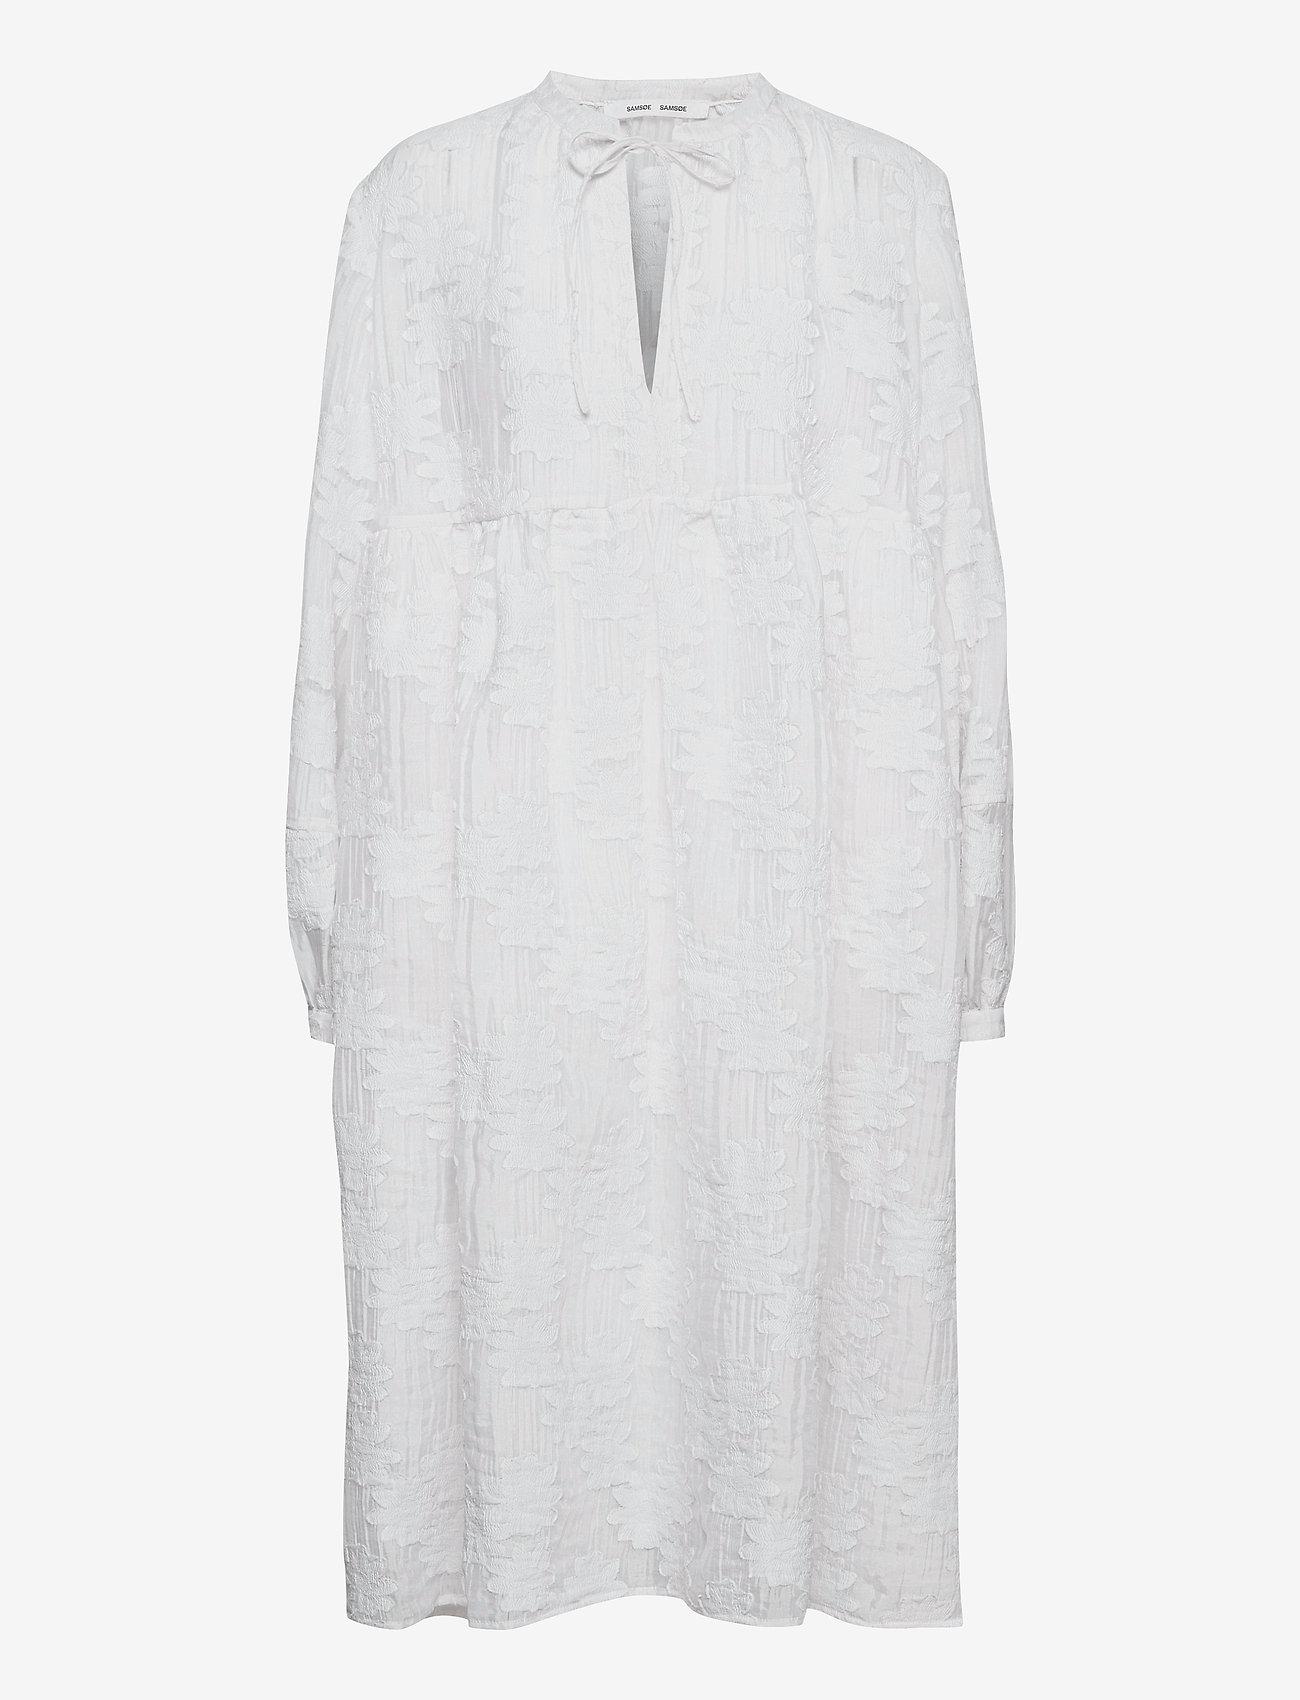 Samsøe Samsøe - Mynthe dress 13049 - blondekjoler - bright white - 0